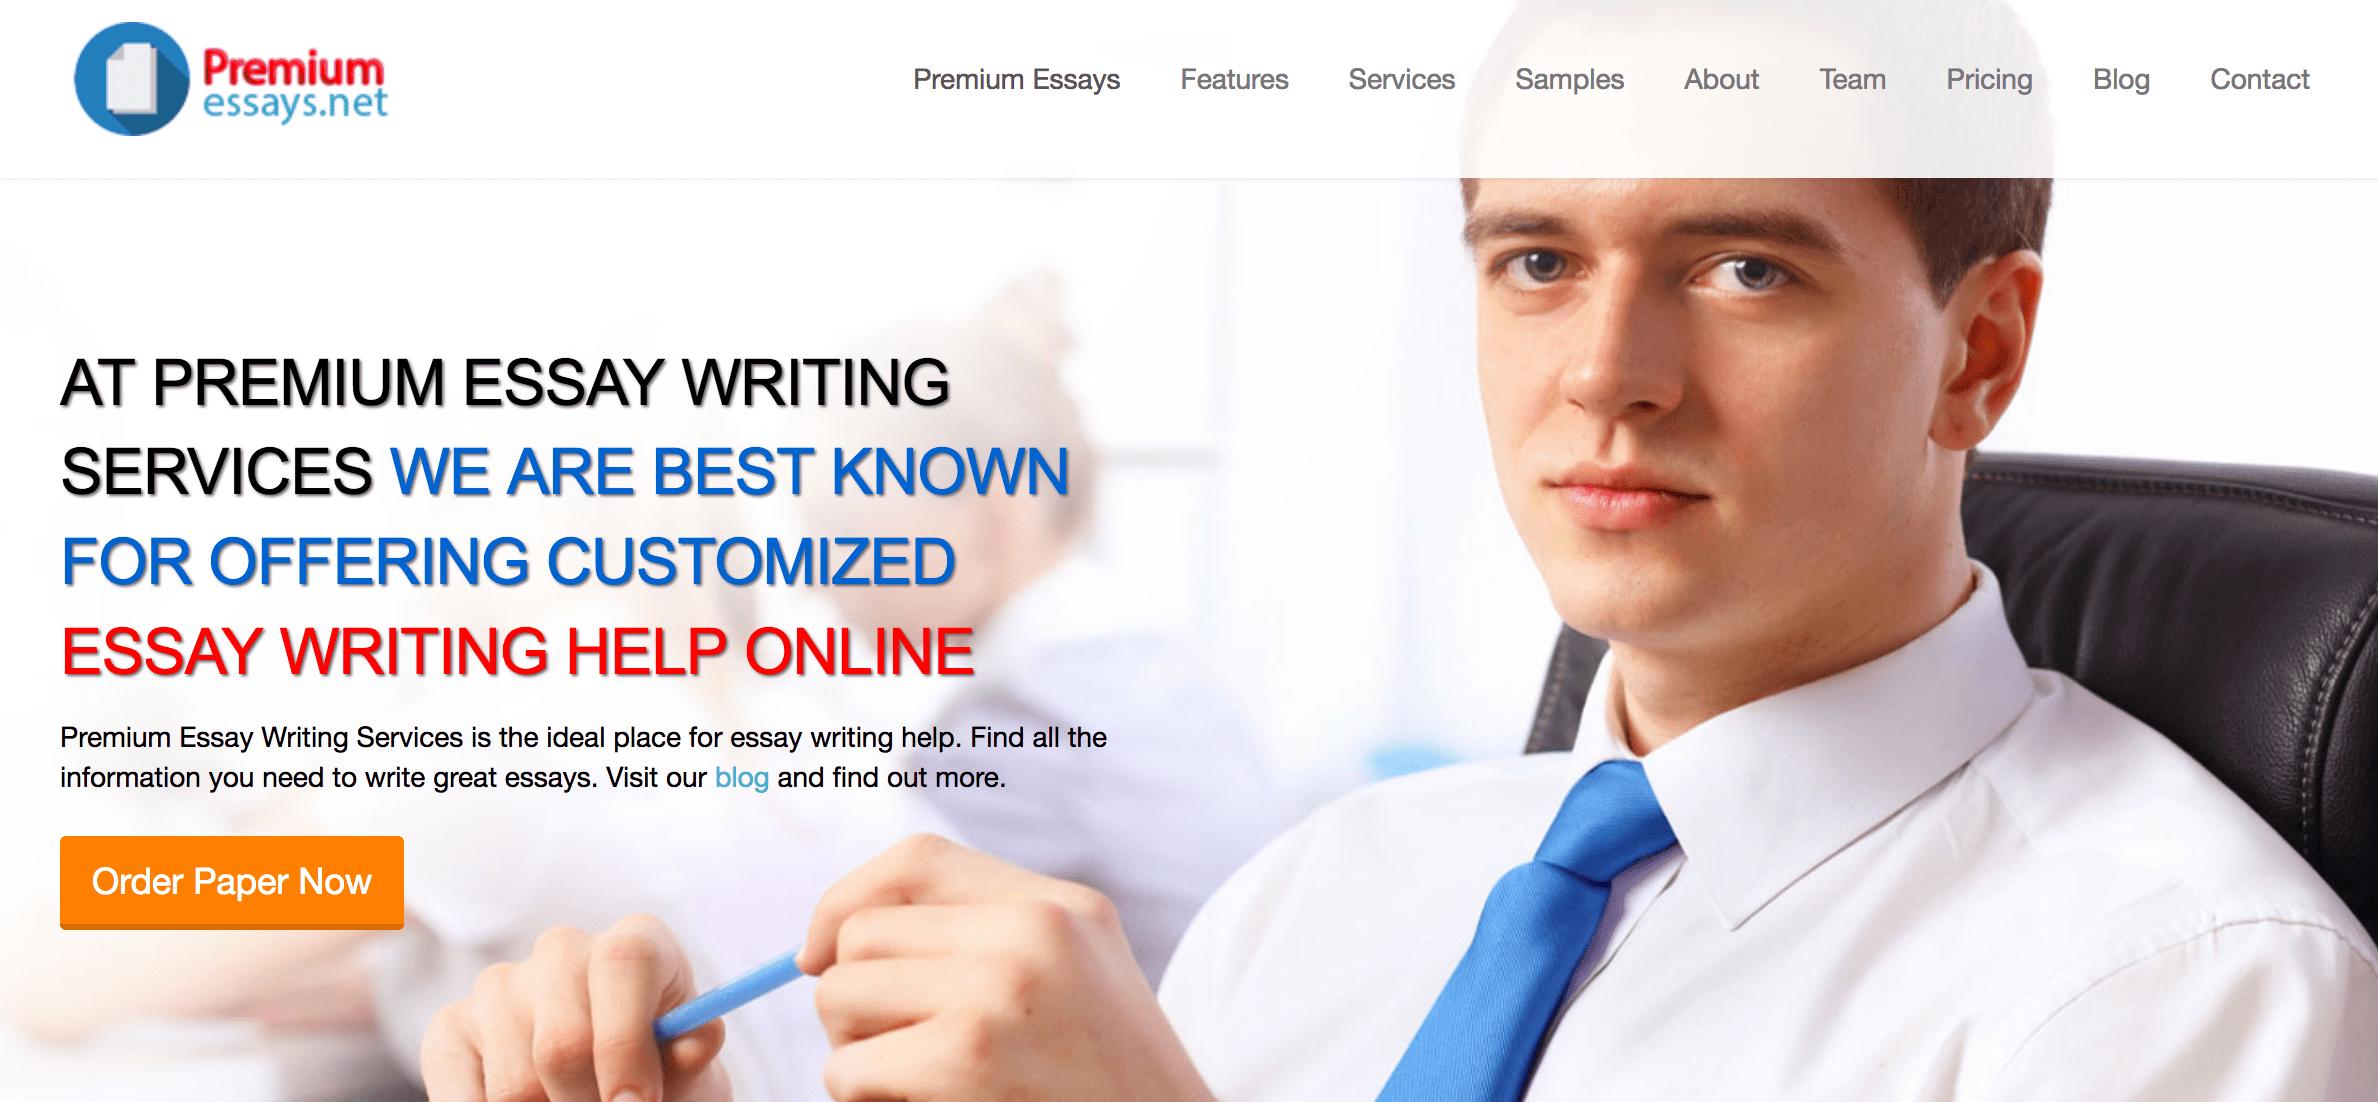 018 Essay Example 3752552280 Premium Writing Service Stupendous Services Online Professional Uk Good Reddit Admission Reviews Full